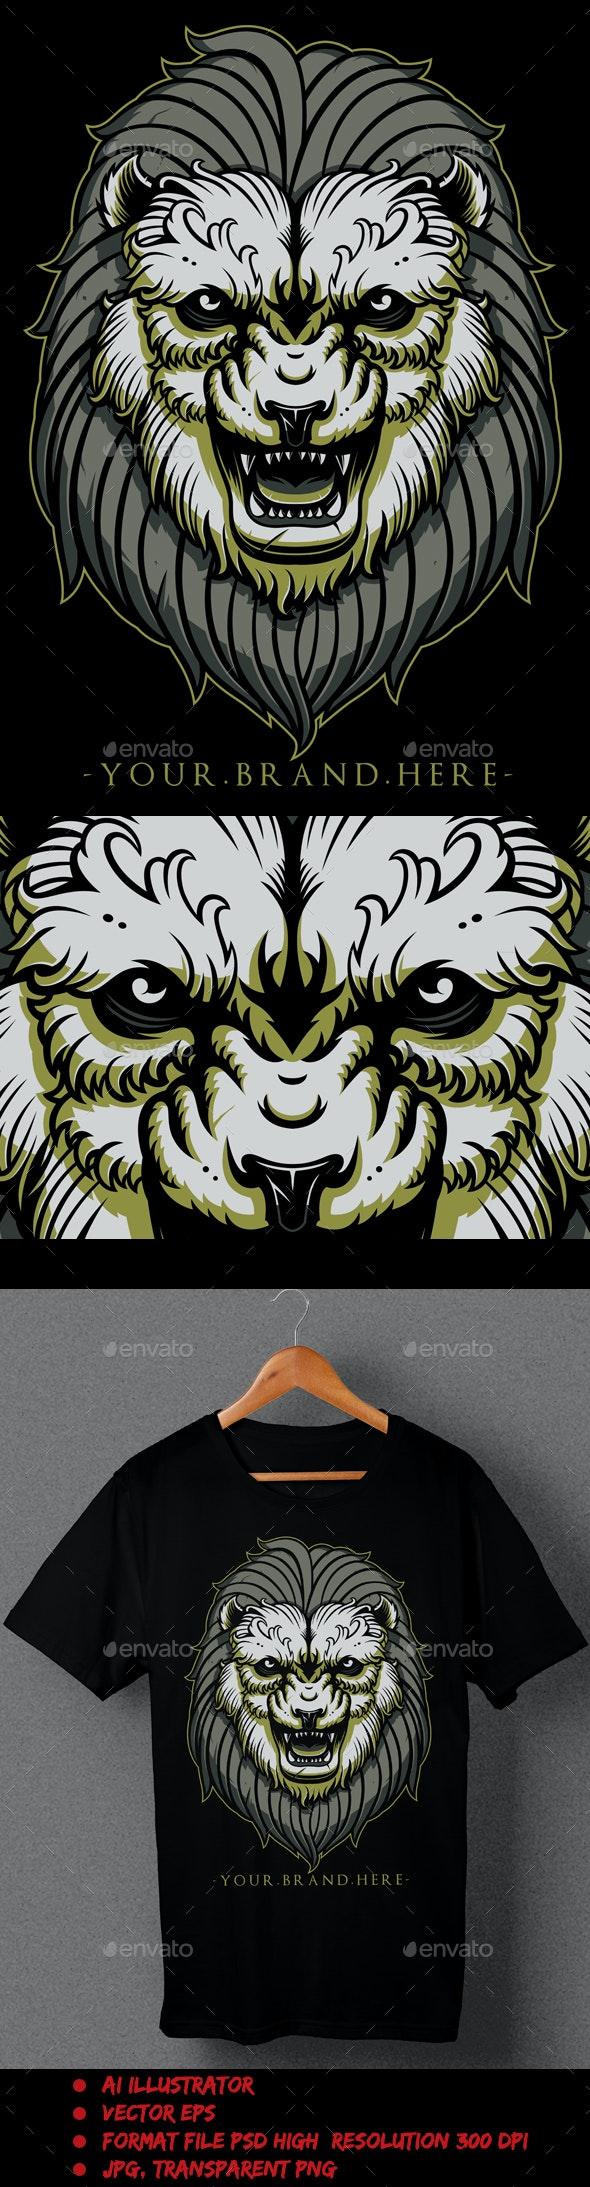 Lion Green - T-Shirts